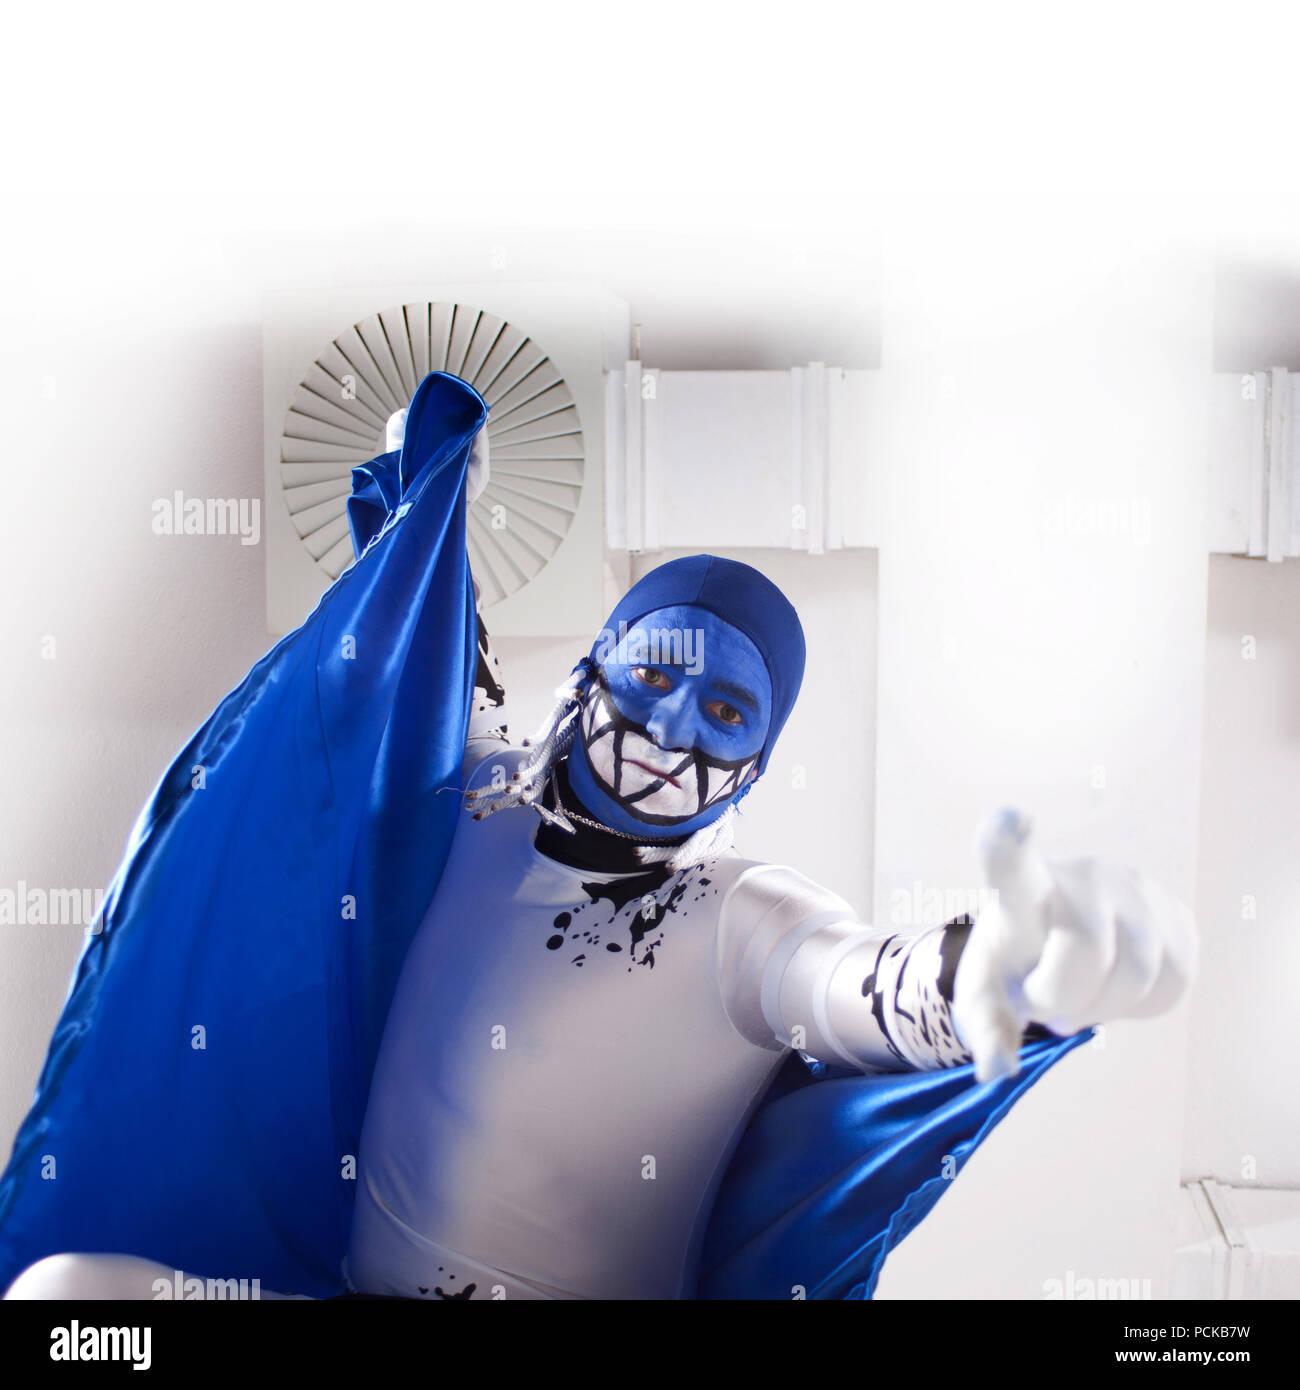 Stadium Kostüm, Schauspieler, Held Stockbild